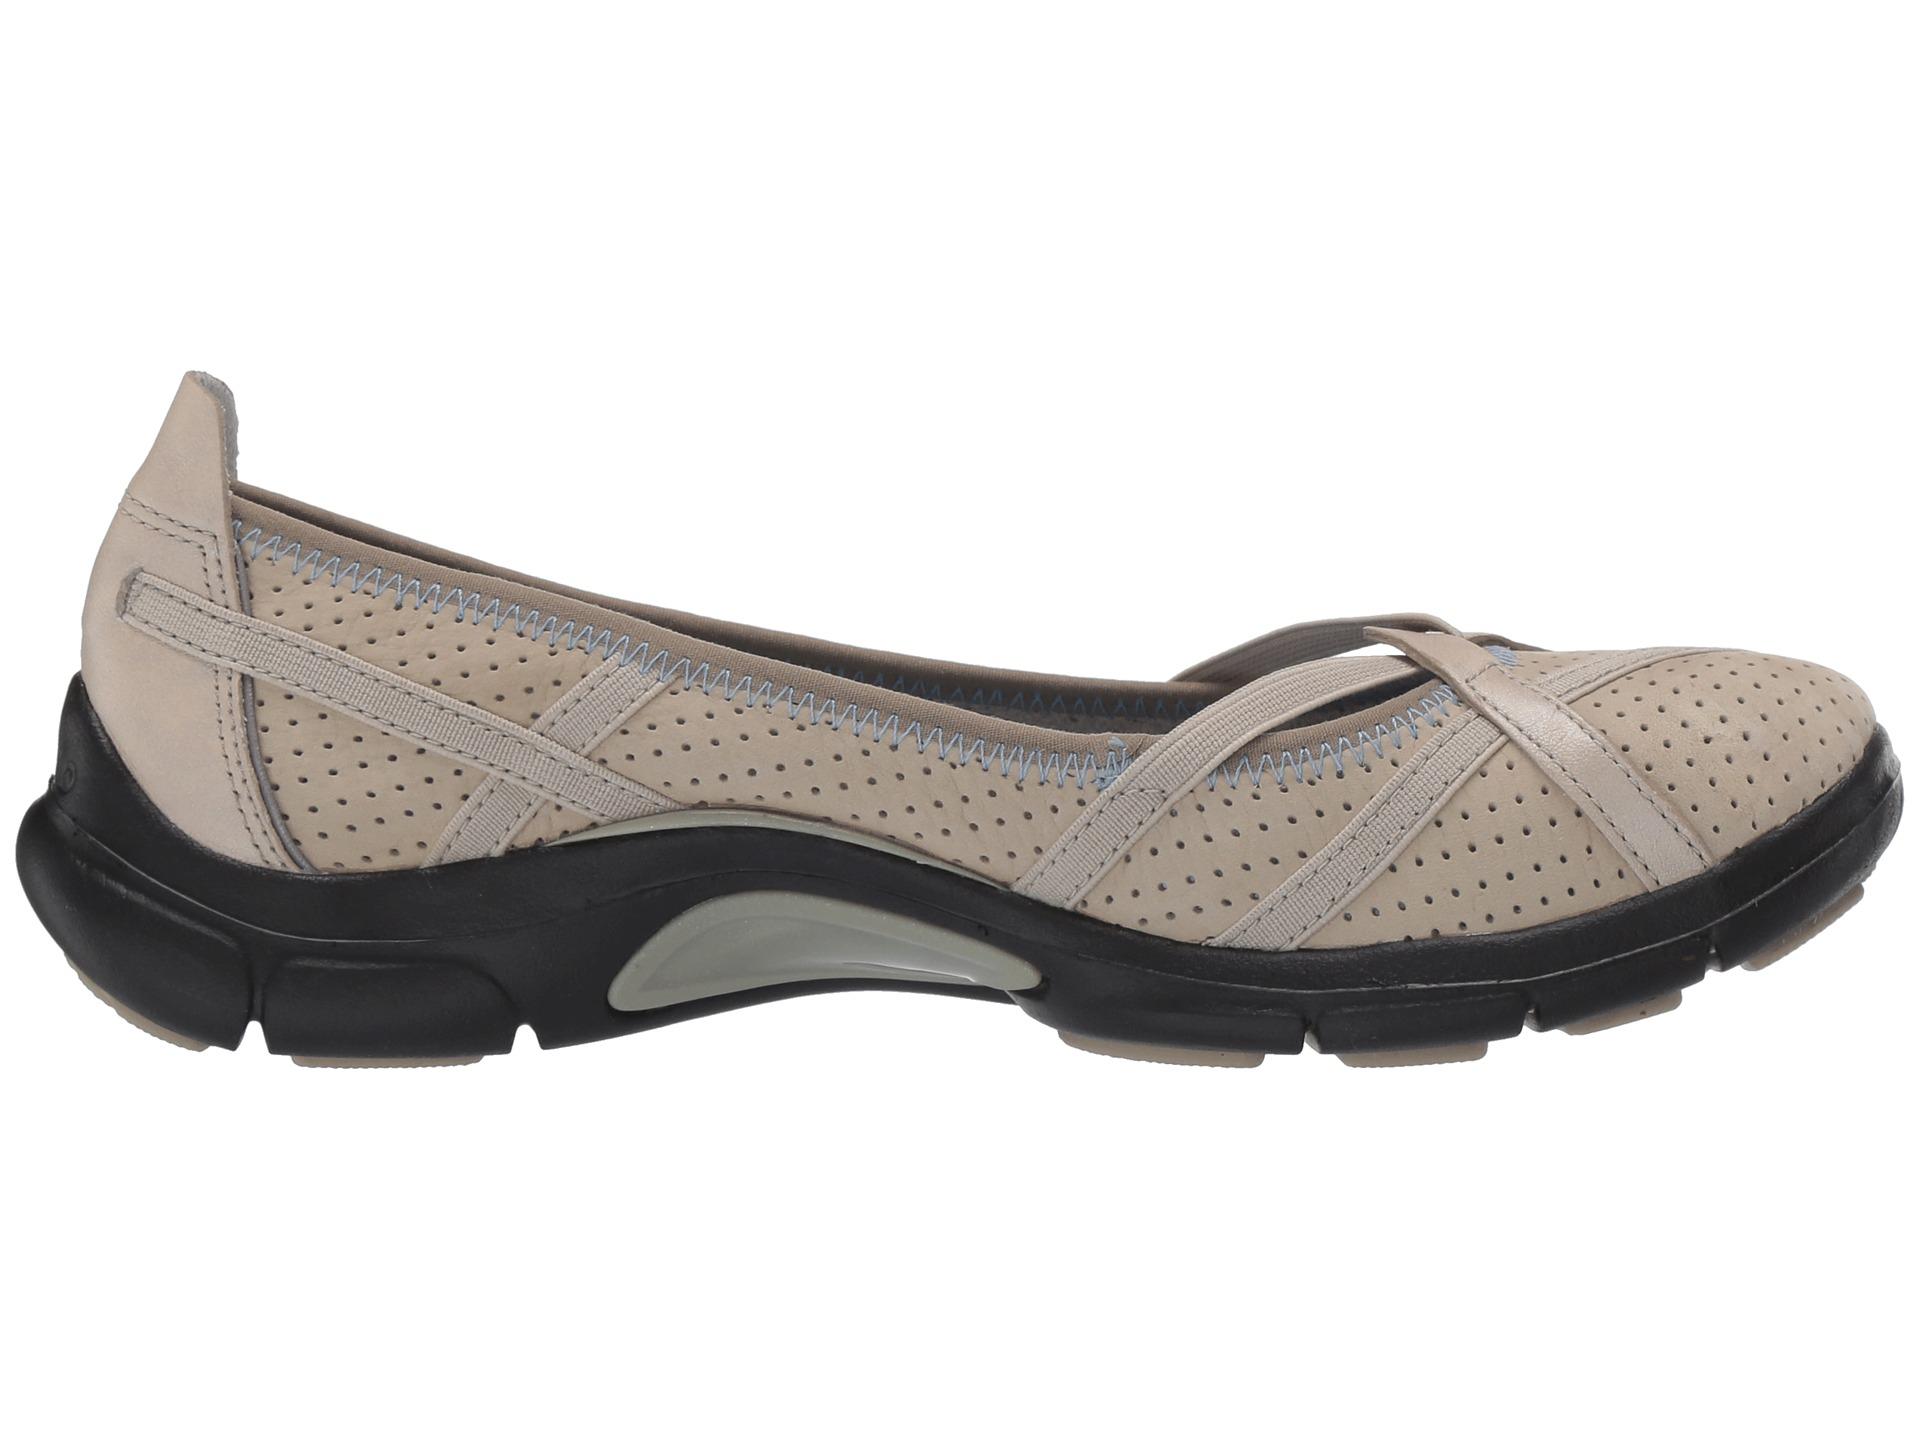 Clarks Privo Shoes Reviews